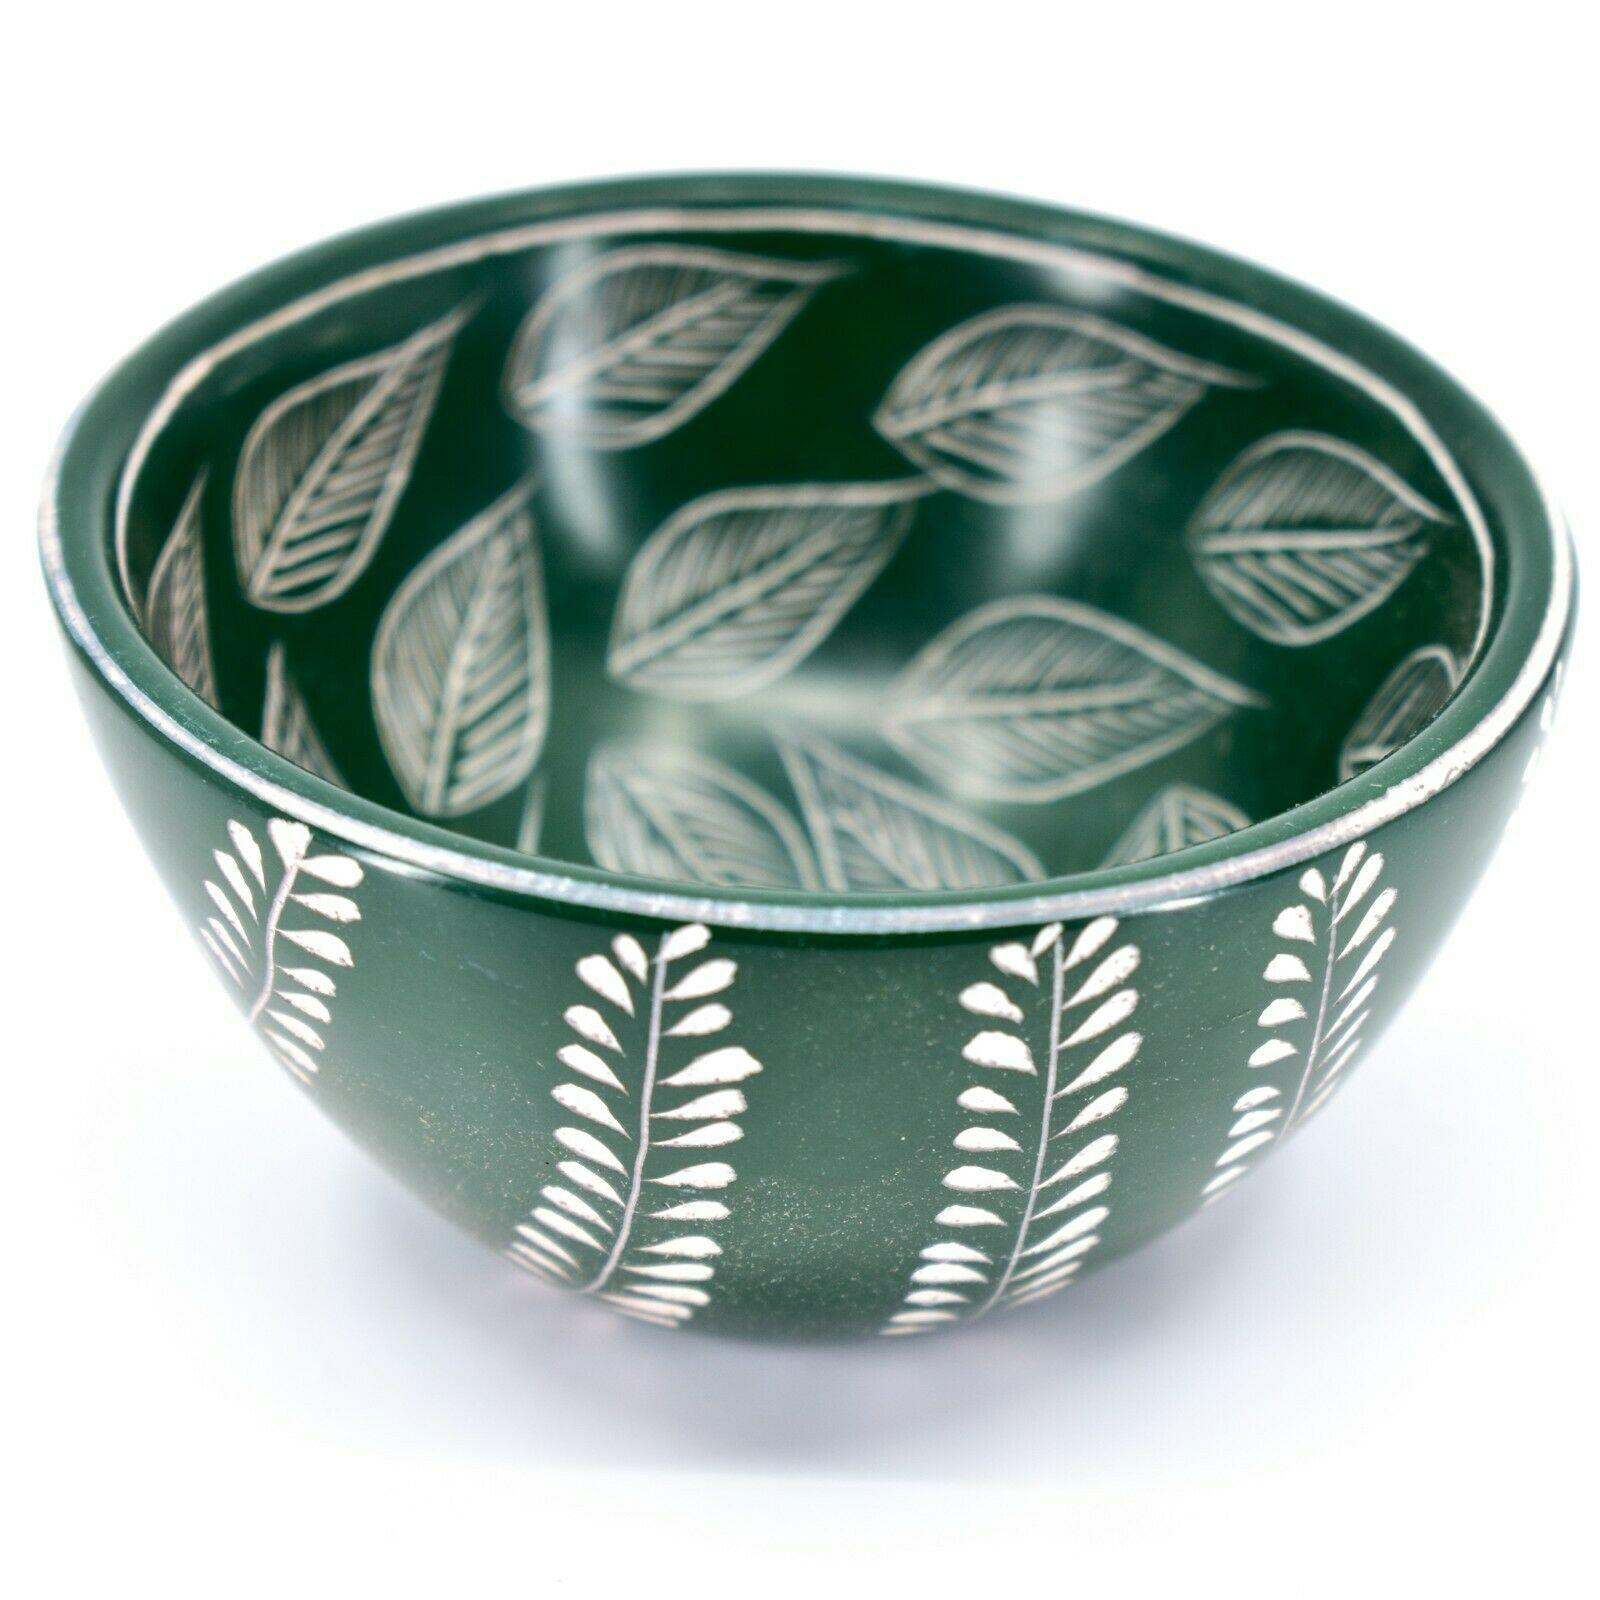 Tabaka Chigware Handmade Soapstone Green Foliage Leaf Design Trinket Bowl Kenya